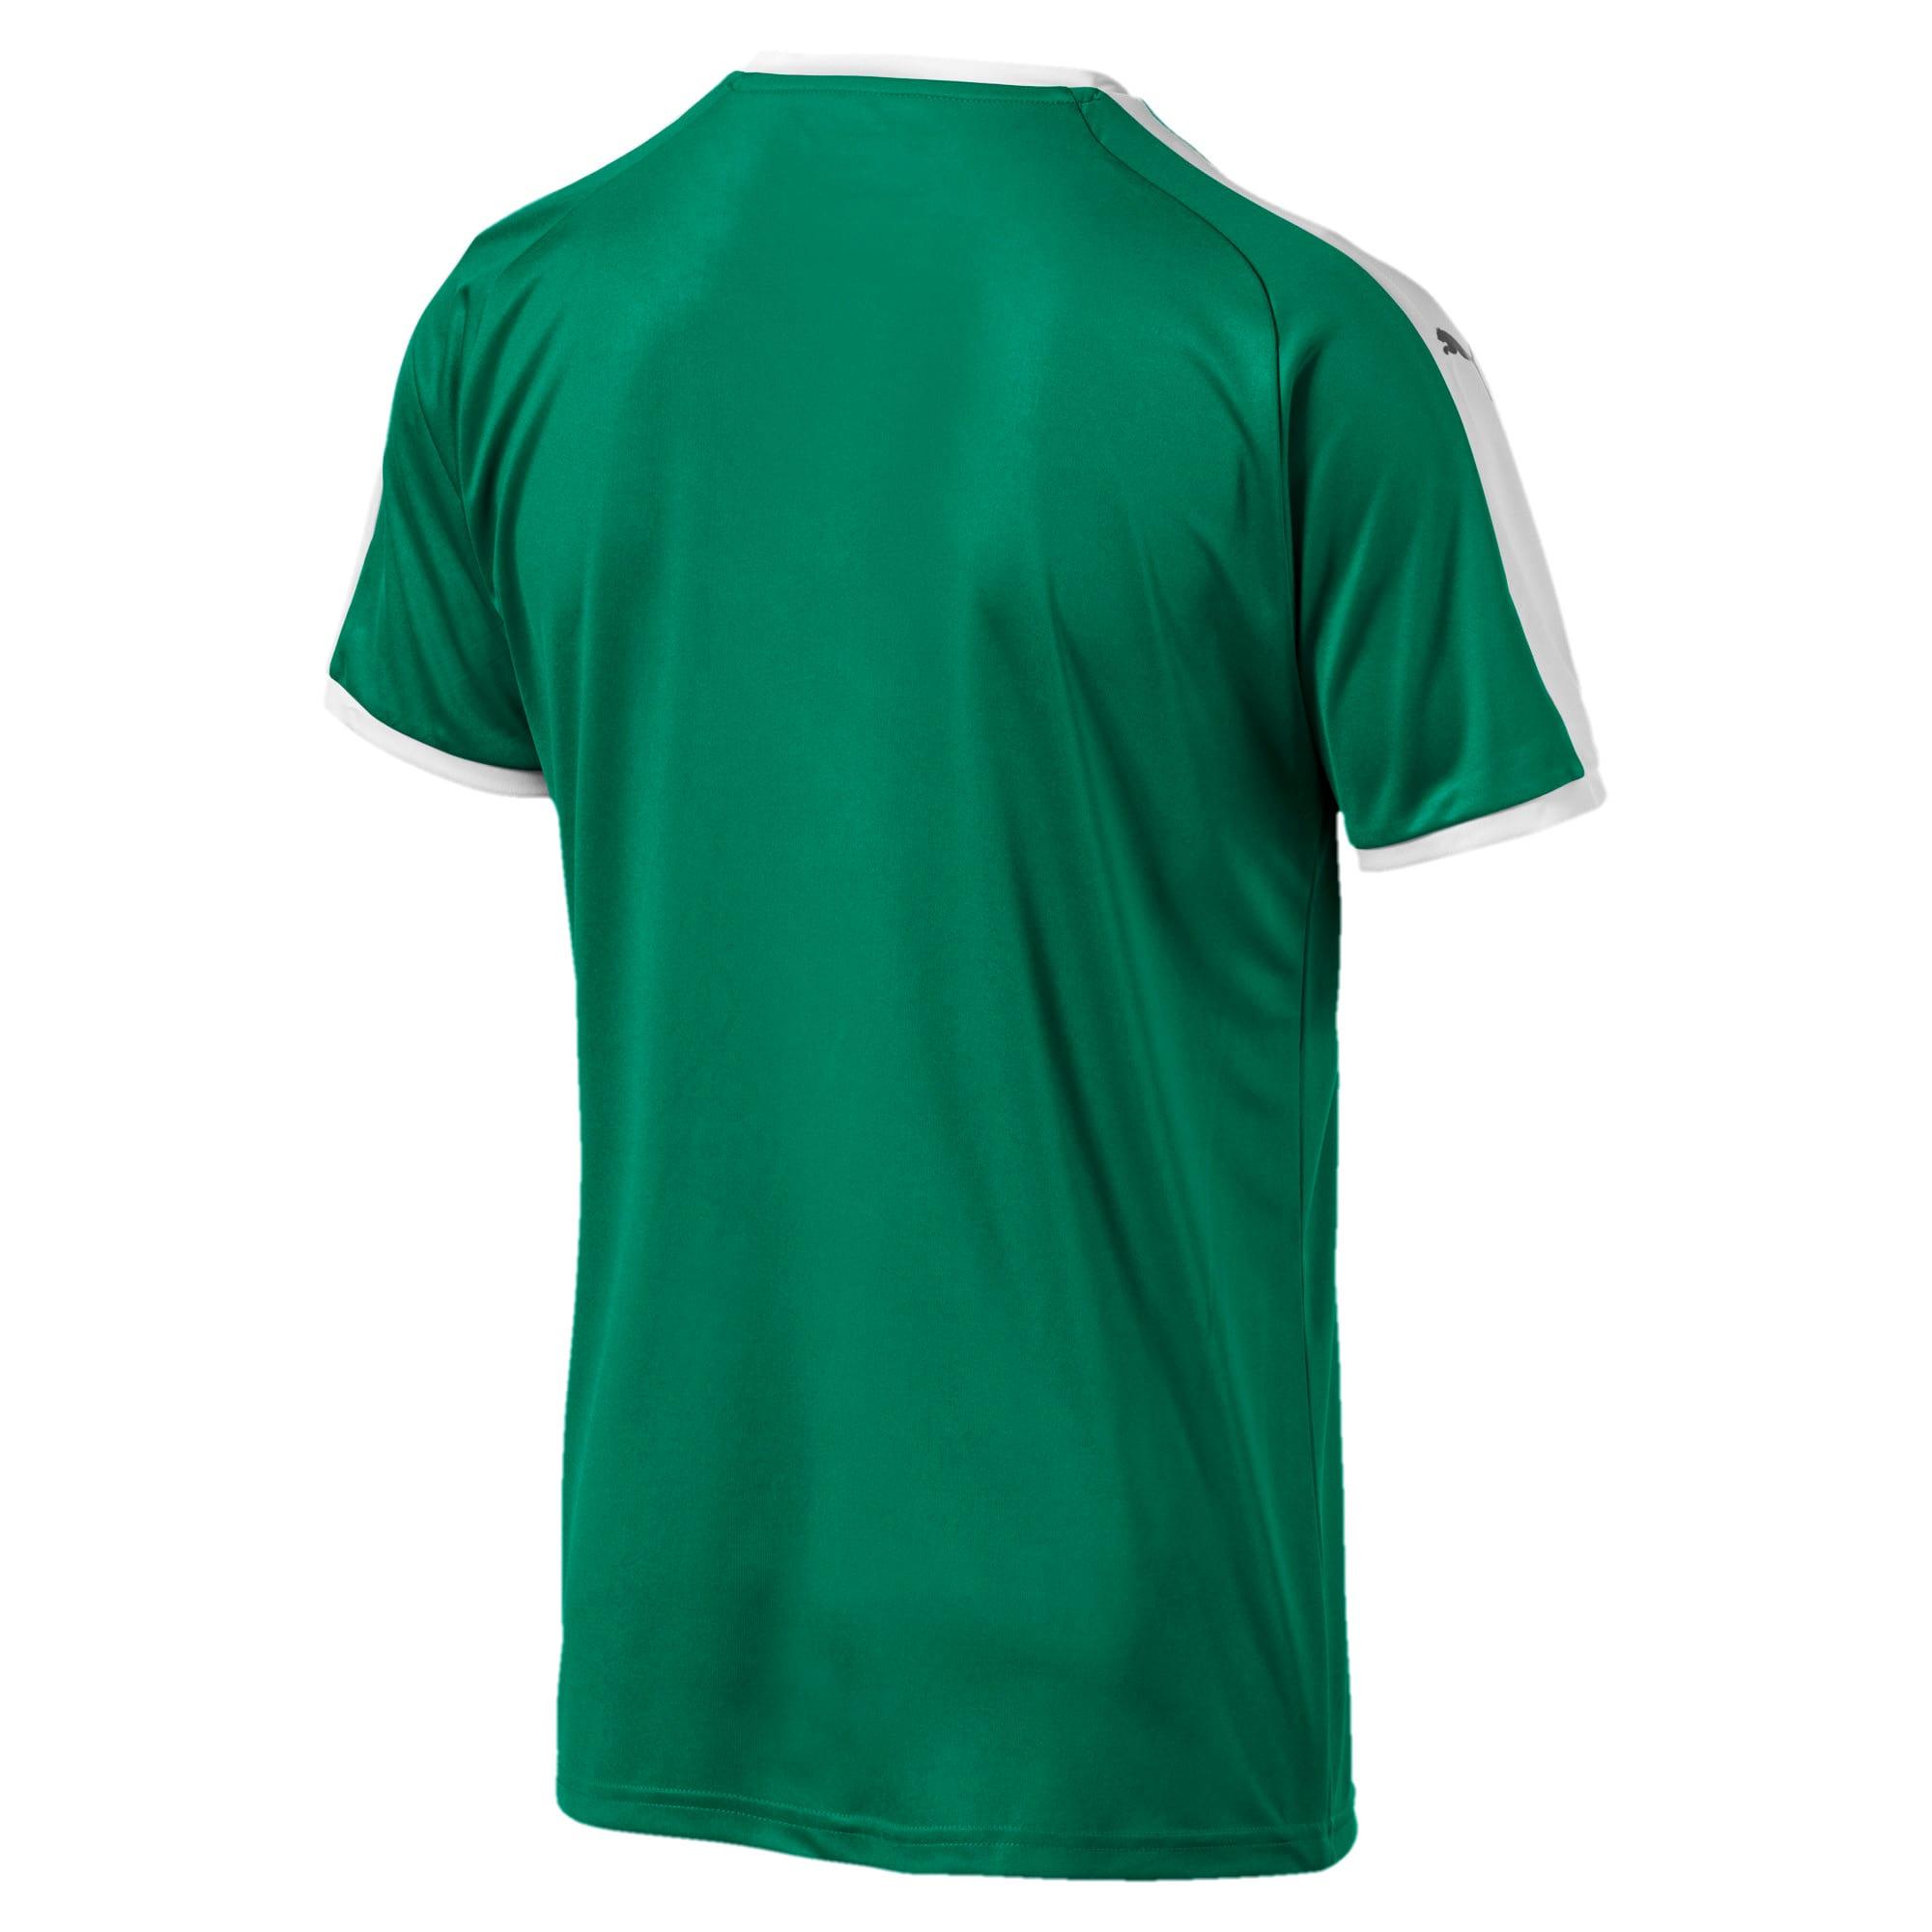 Thumbnail 2 of Senegal Men's Away Replica Jersey, Pepper Green-Puma White, medium